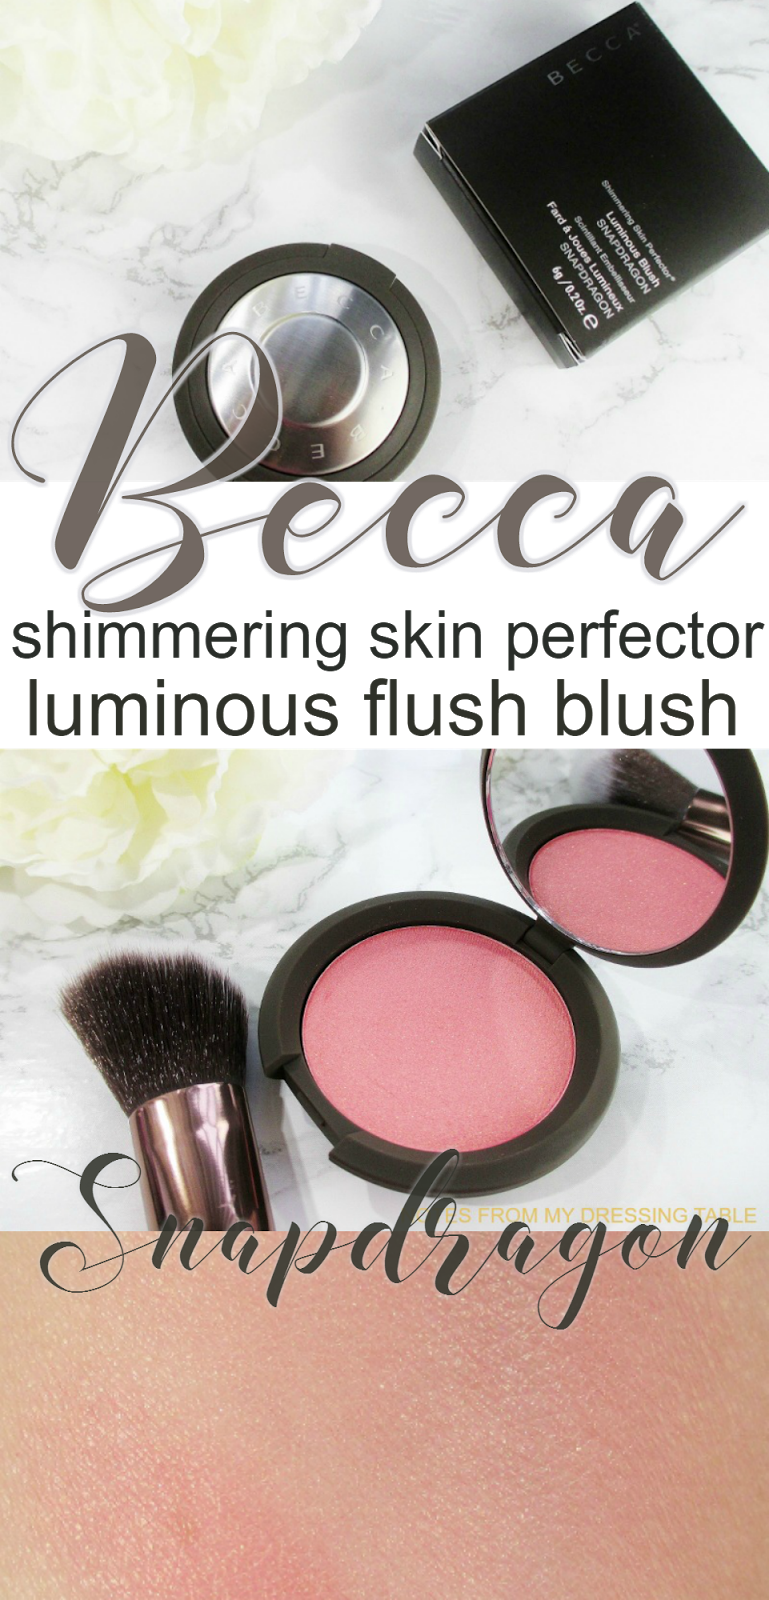 becca-shimmering-skin-perfector-luminous-blush-snapdragon-3